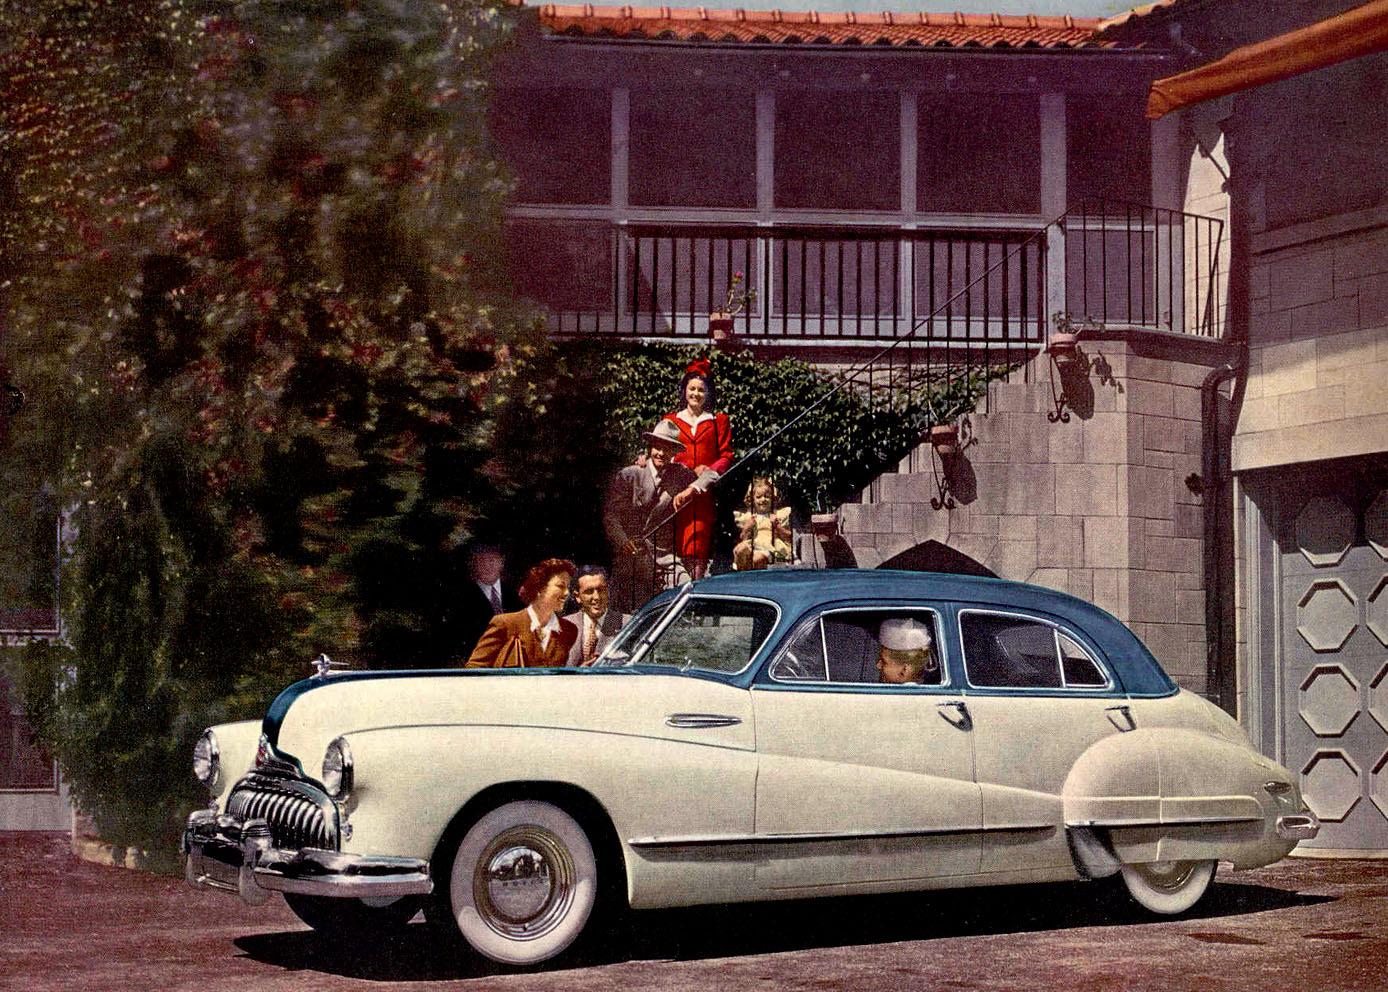 1948 Plymouth Special Deluxe Wiring Diagram 1941 Auto Diagrams 1972